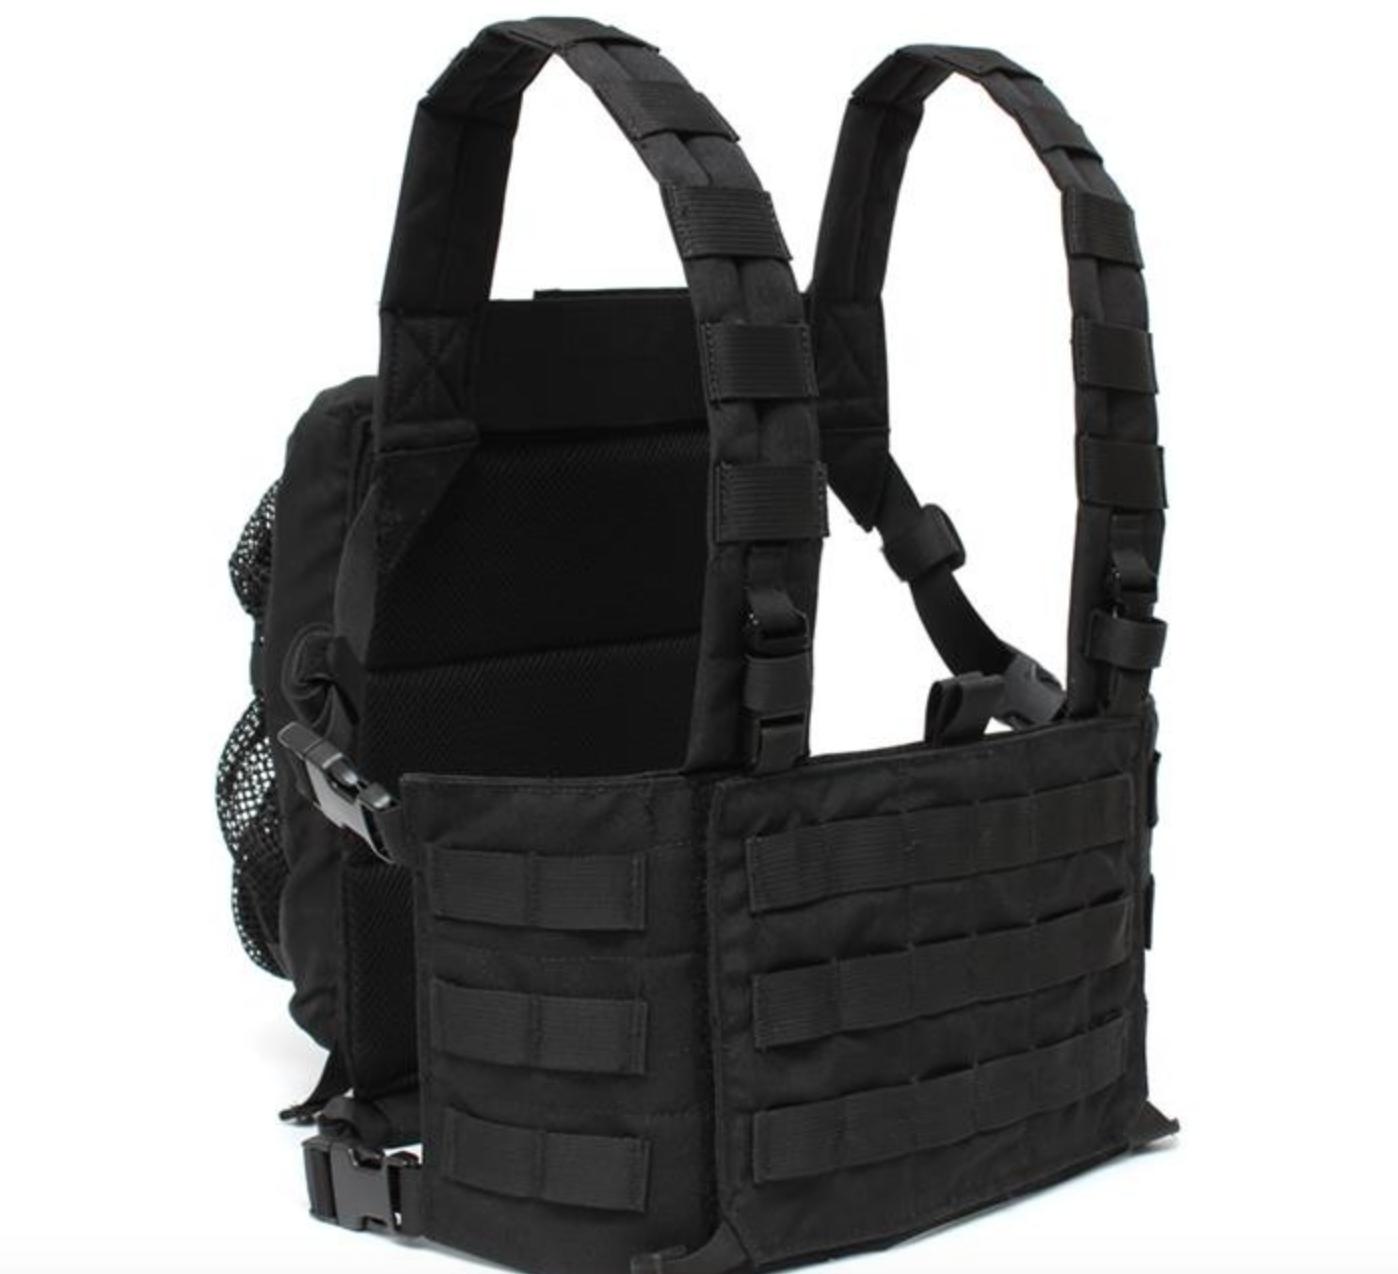 LBX Assault Chest Rig Kit - Size small Medium 7f65903ece00